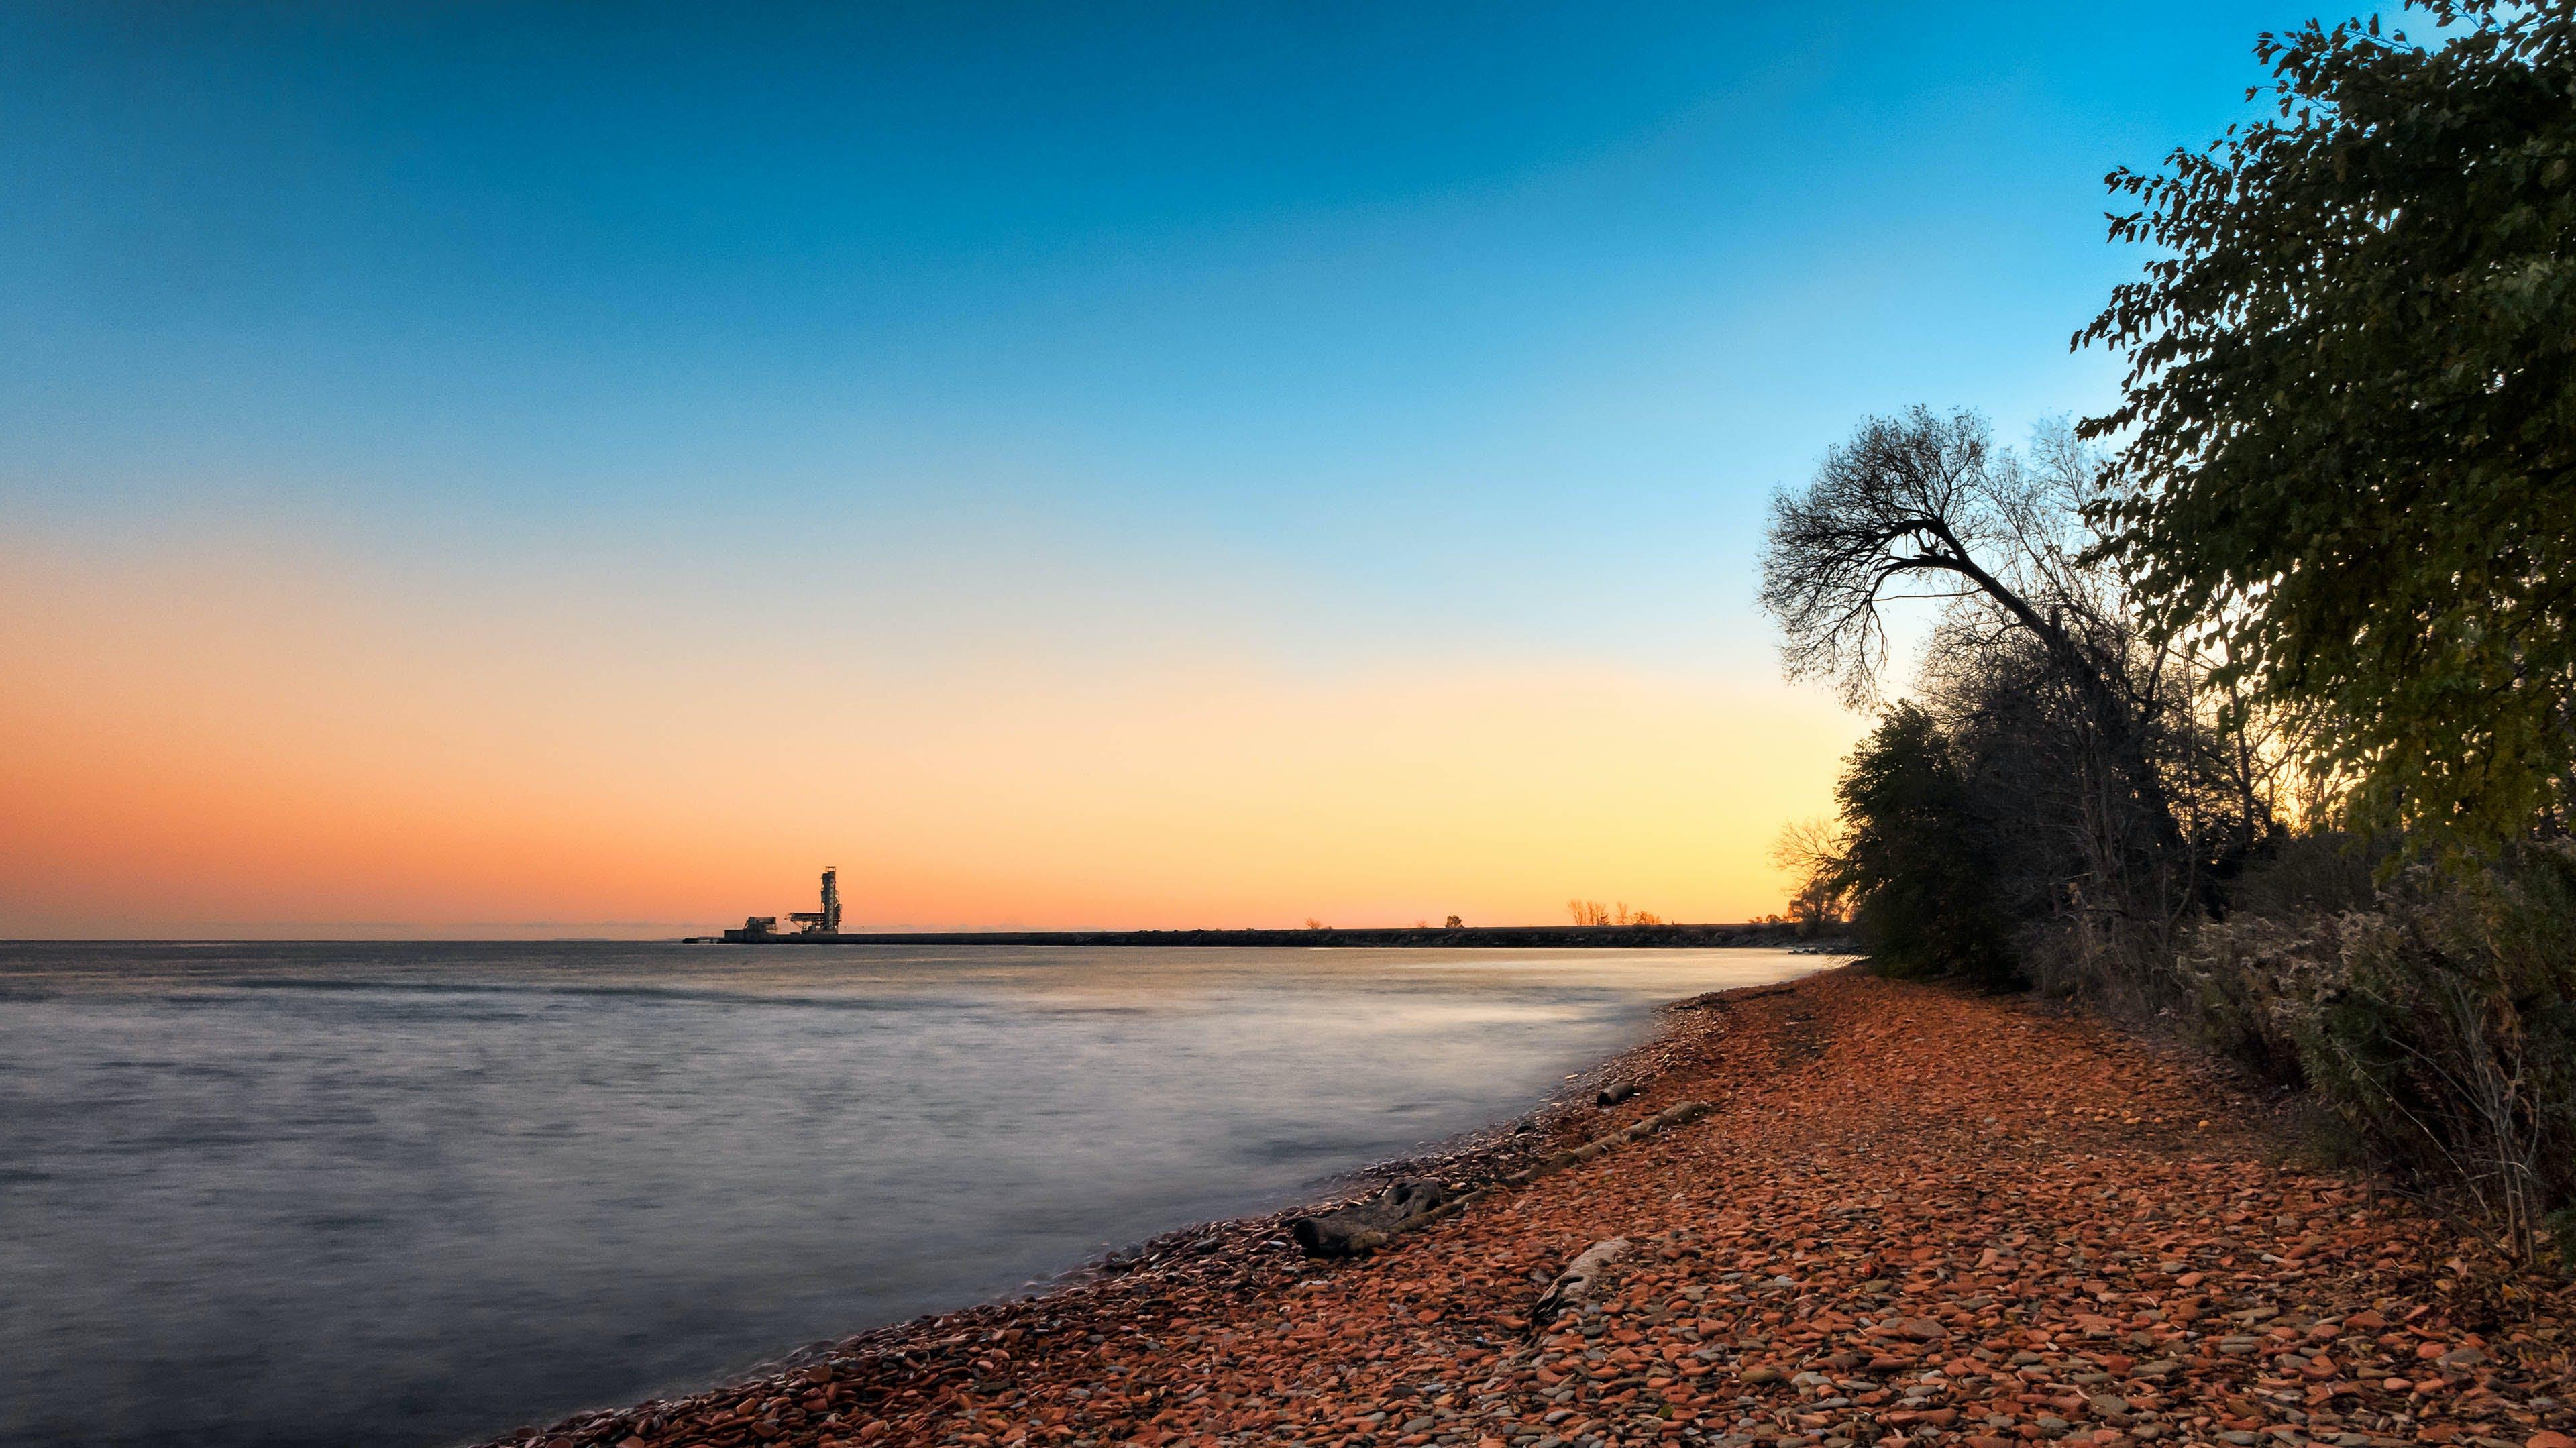 Trees on Shoreline Under Blue Sky